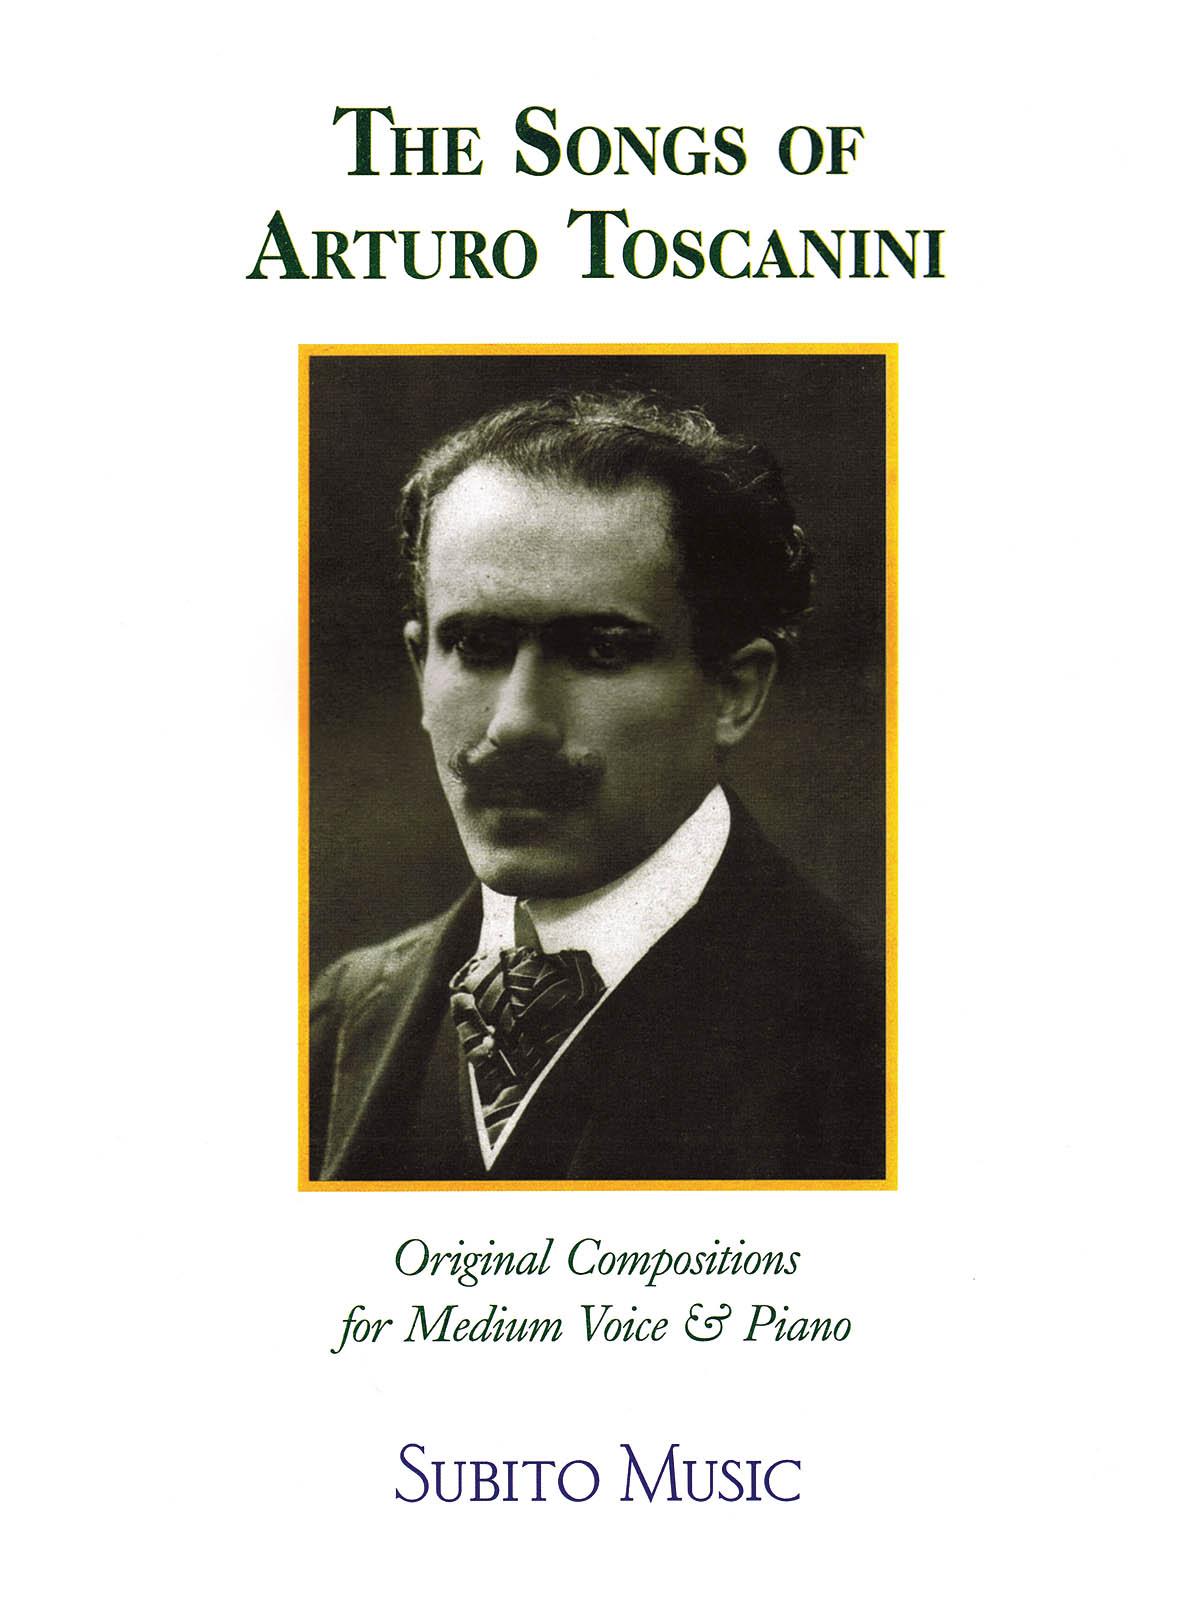 Arturo Toscanini: The Songs of Arturo Toscanini: Vocal Solo: Vocal Collection